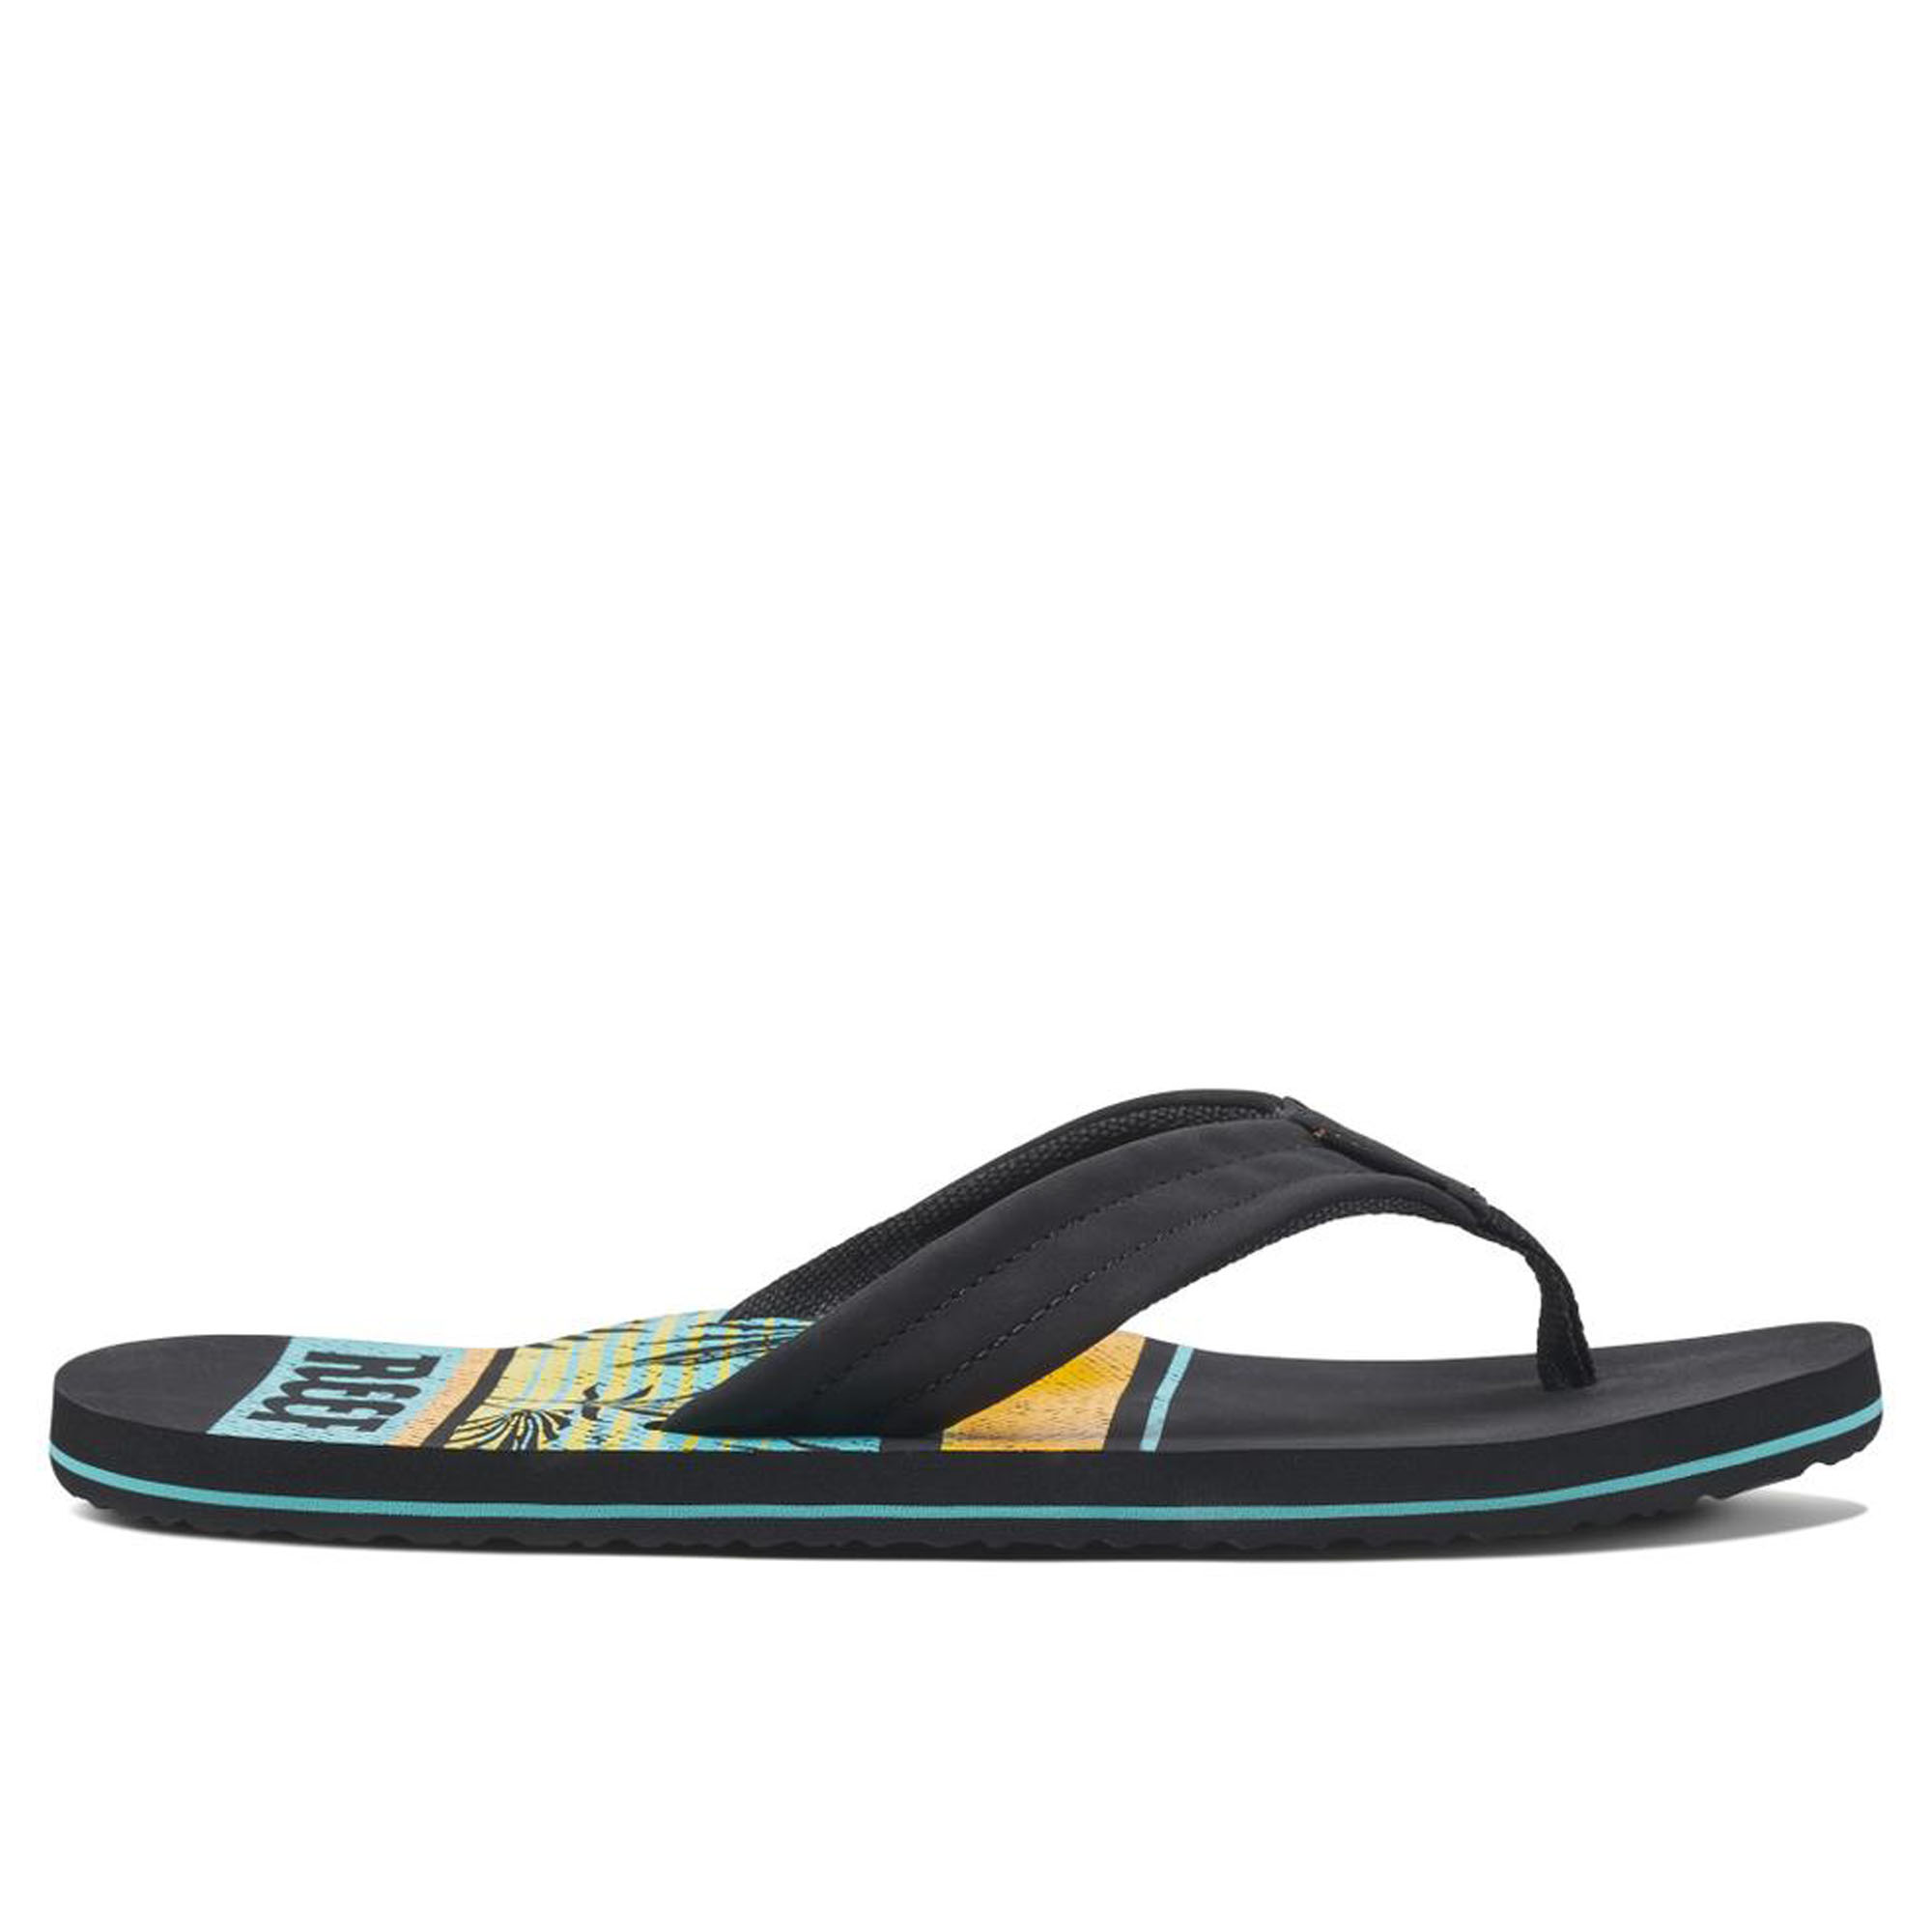 fbfde953212c Reef Men s Reef Waters Sandals - Sun   Ski Sports